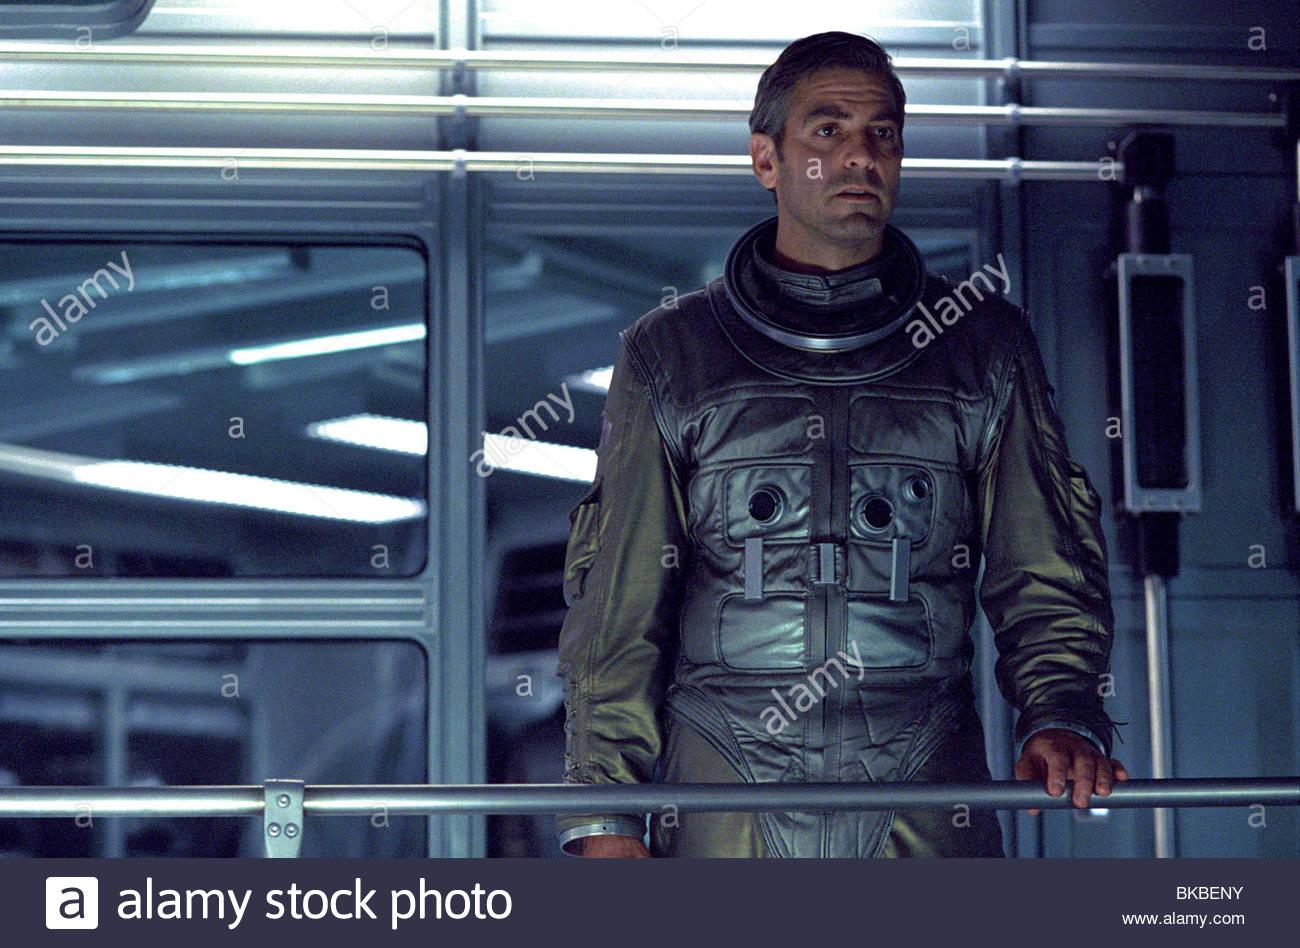 Solaris George Clooney Stock Photos Solaris George Clooney Stock 1300x948